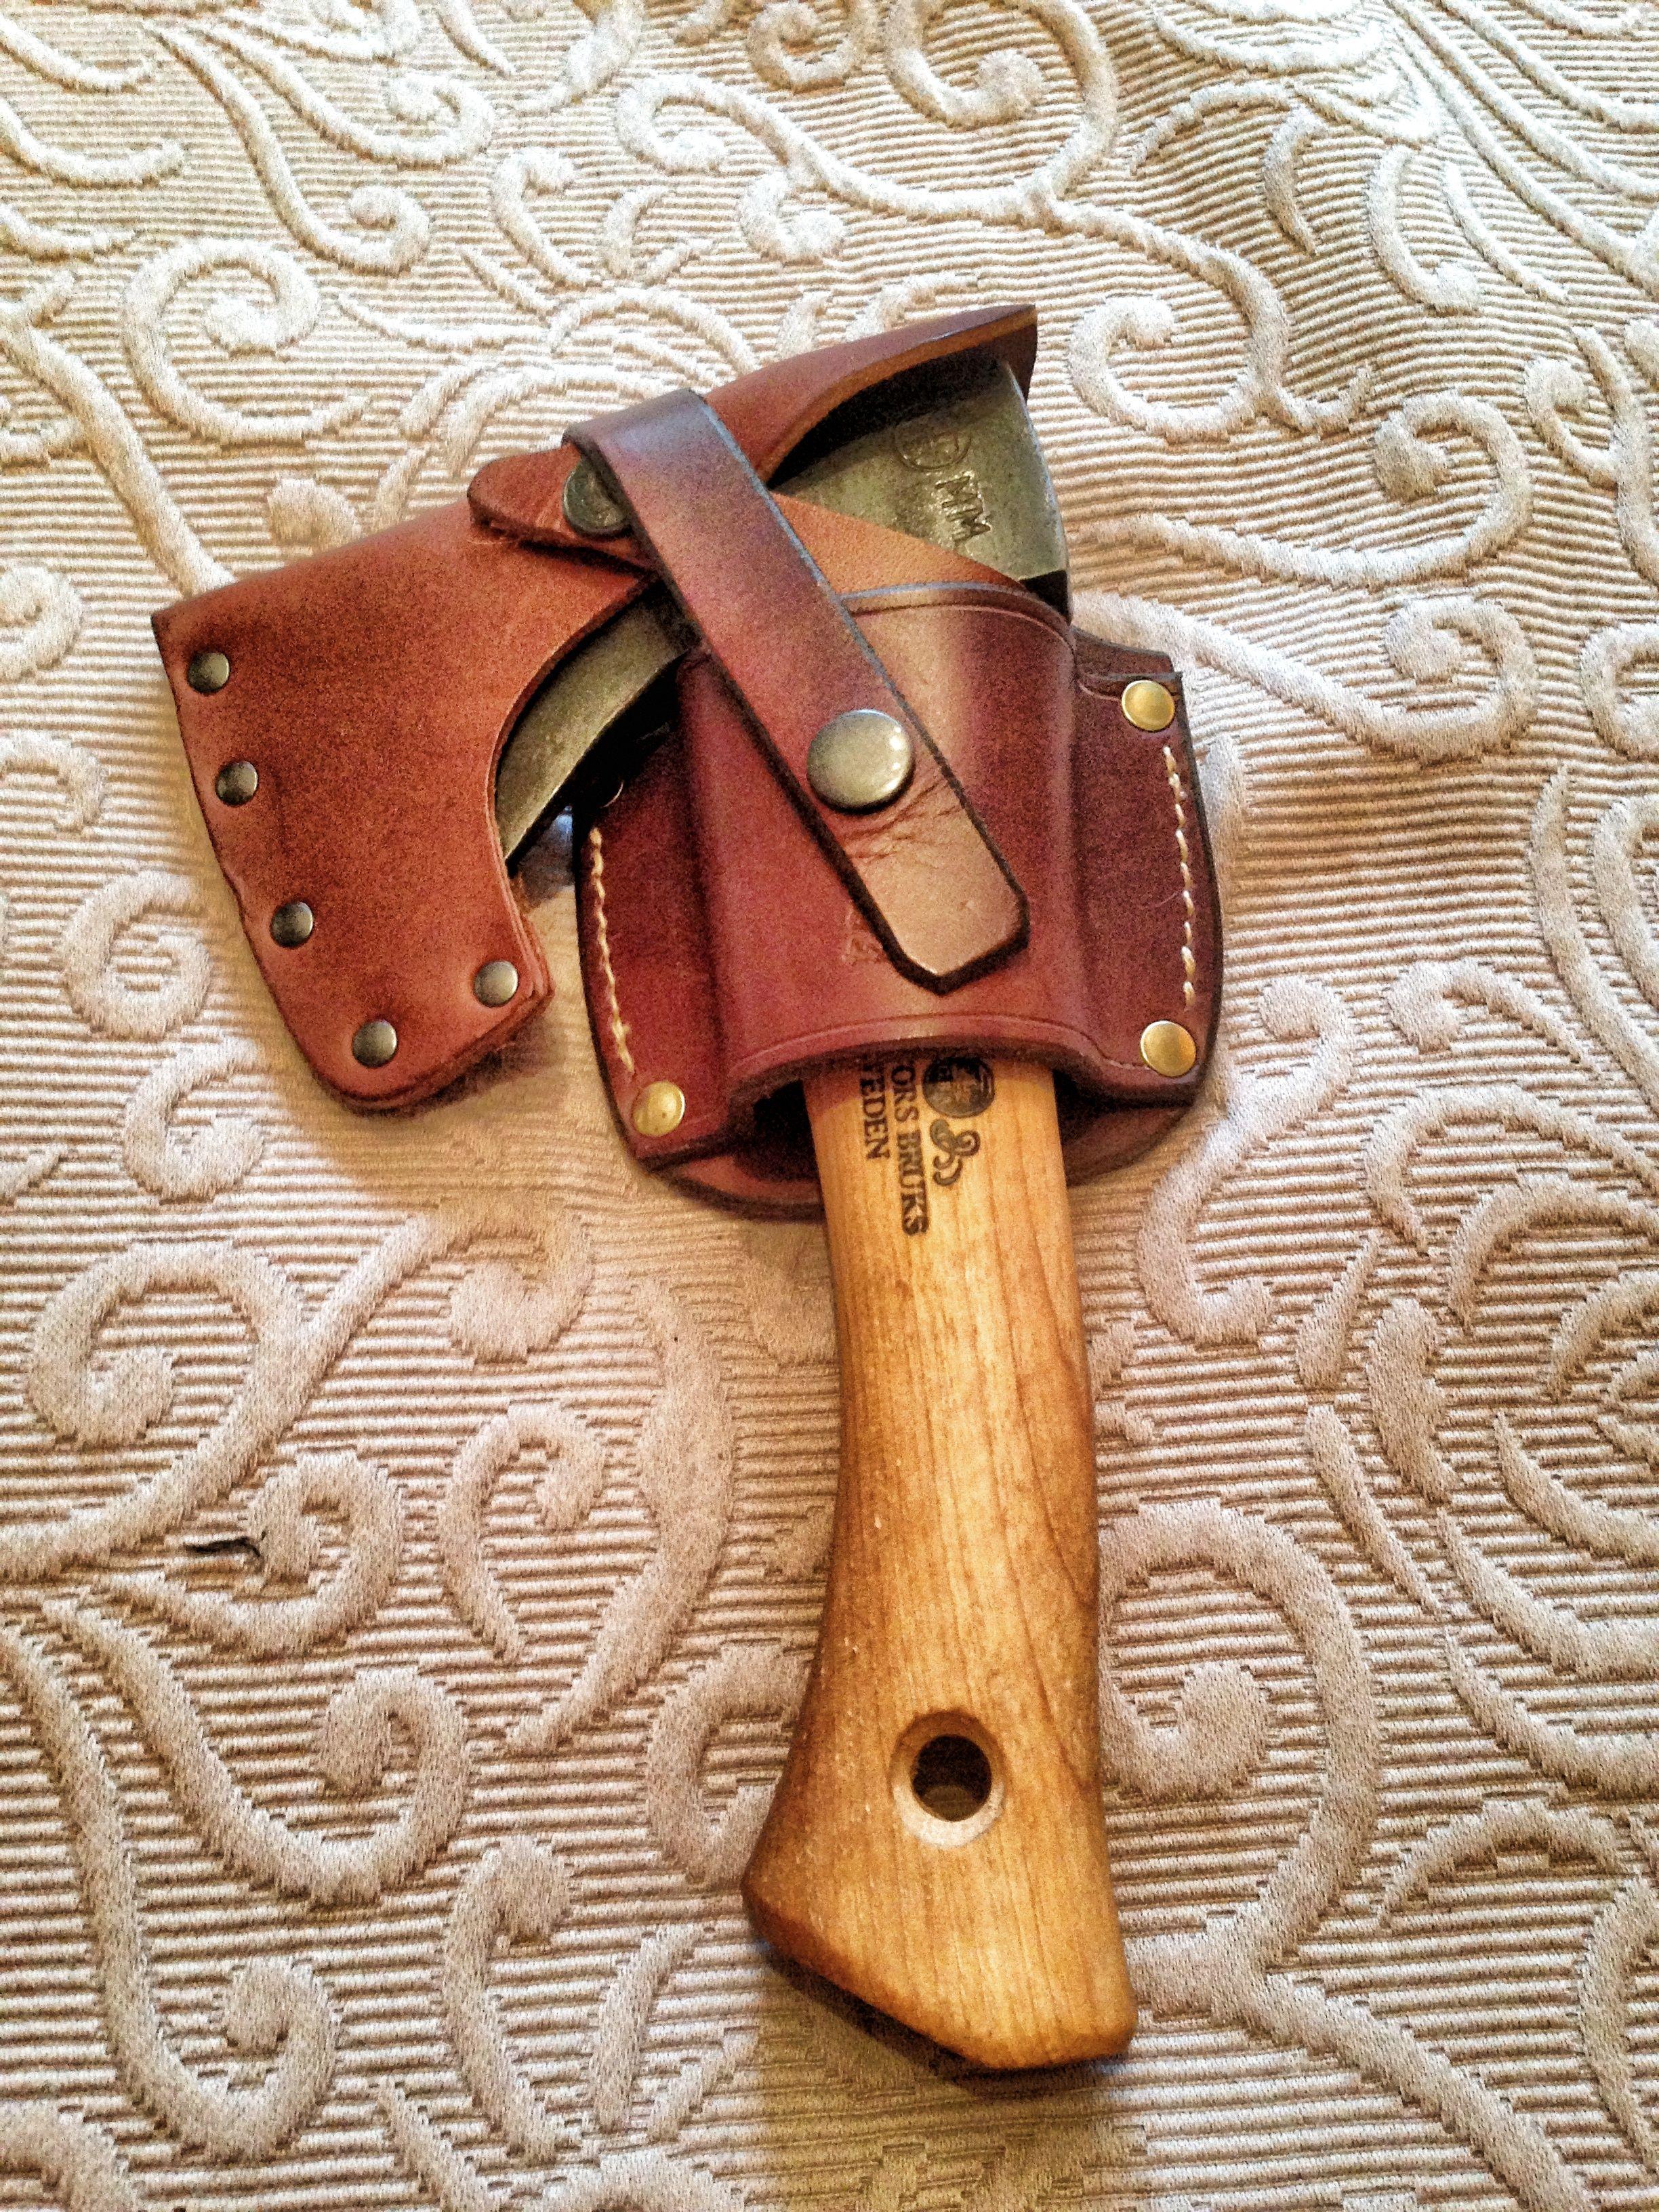 bushcraft wood carving ideas - Google Search